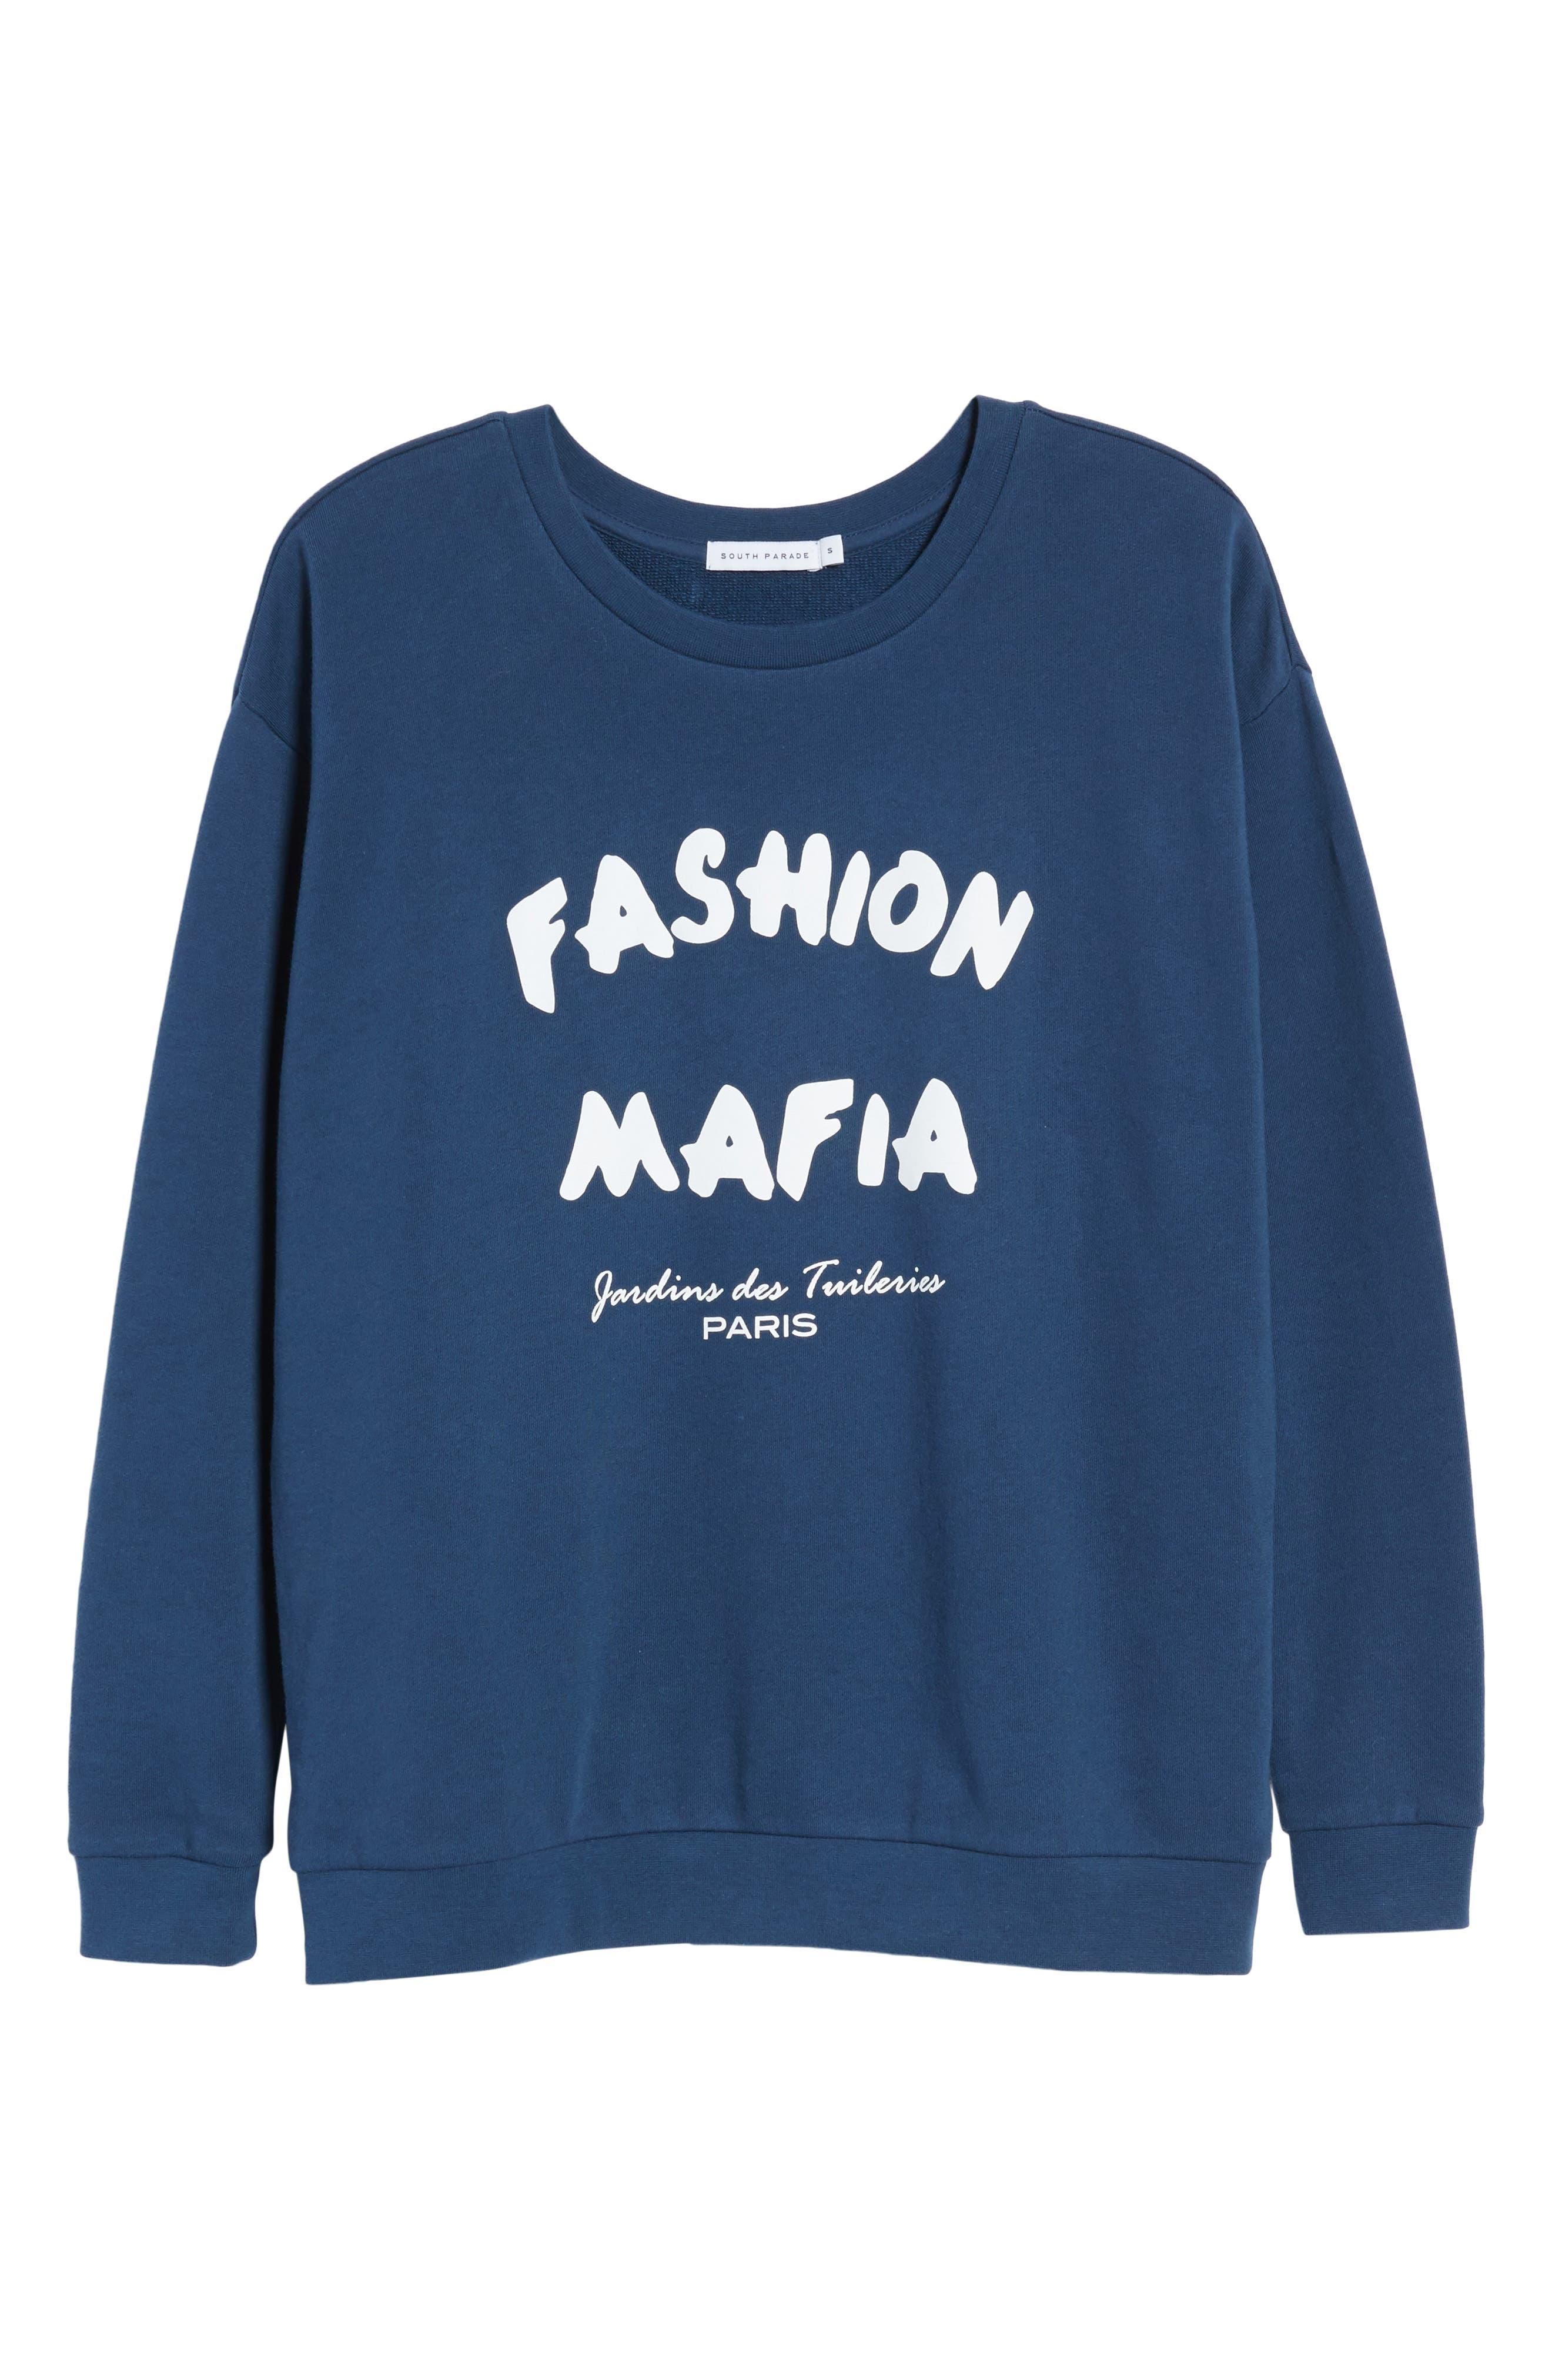 Alexa - Fashion Mafia Sweatshirt,                             Alternate thumbnail 7, color,                             400